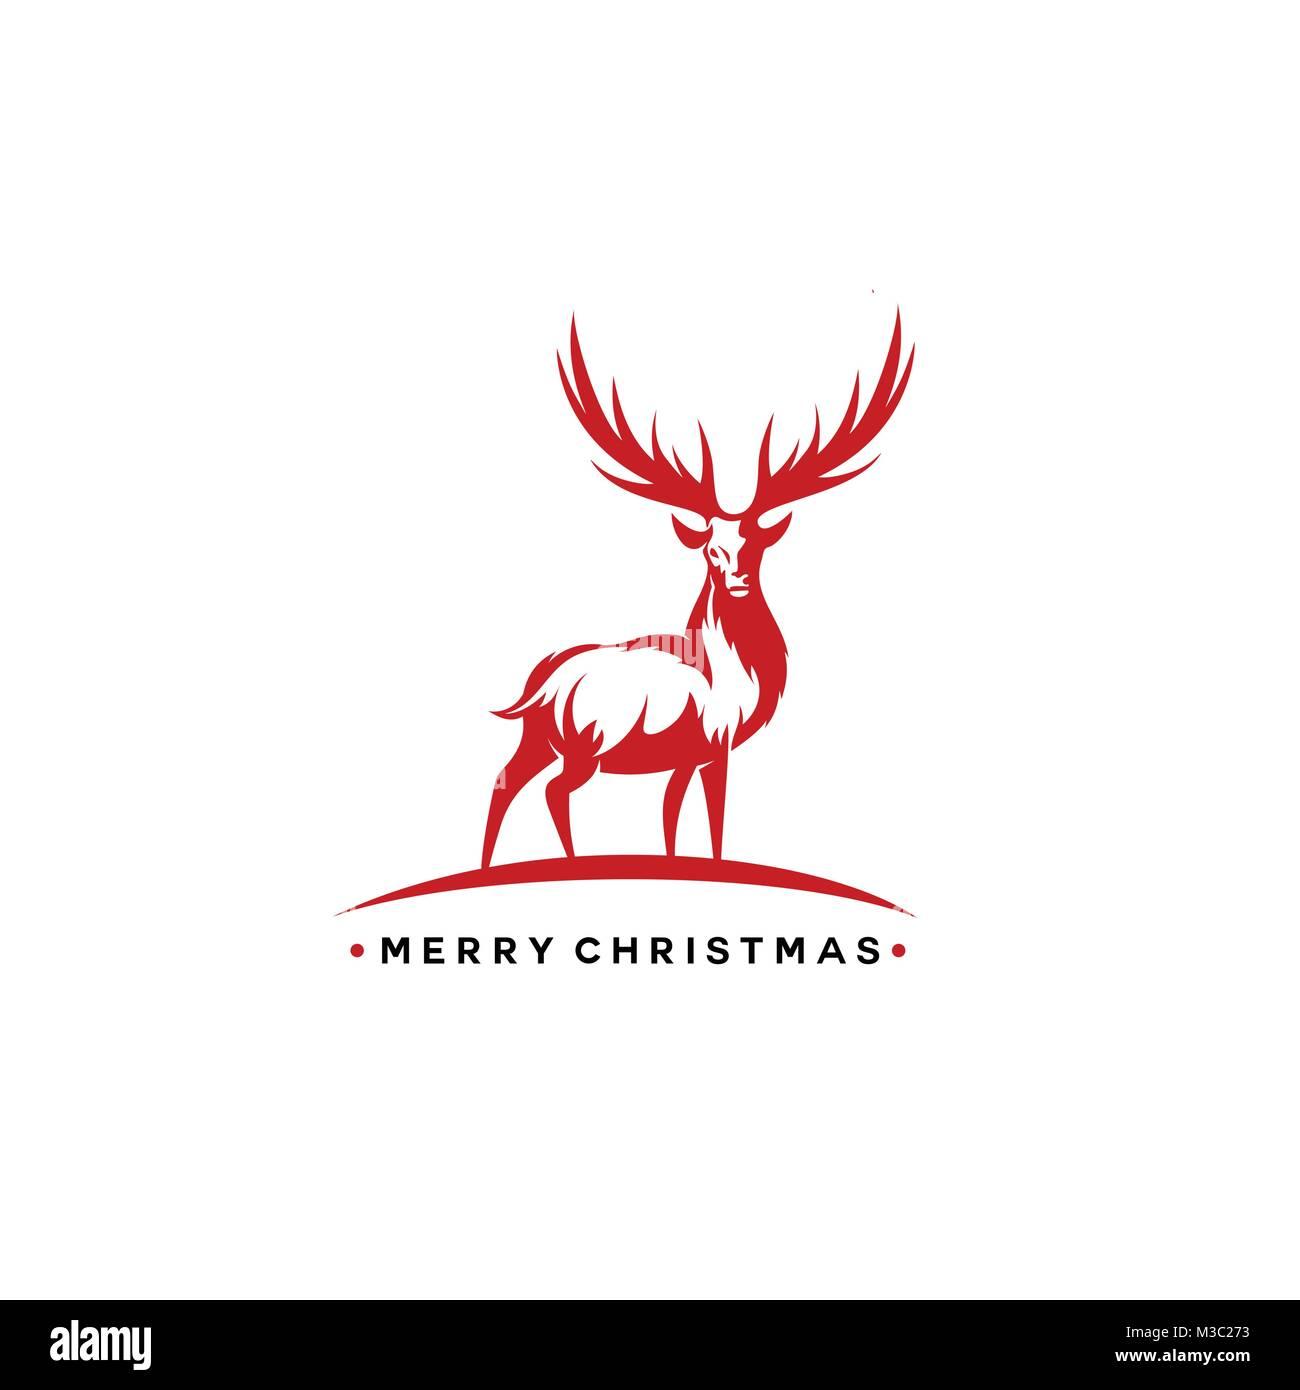 Christmas deer vector illustration. - Stock Image